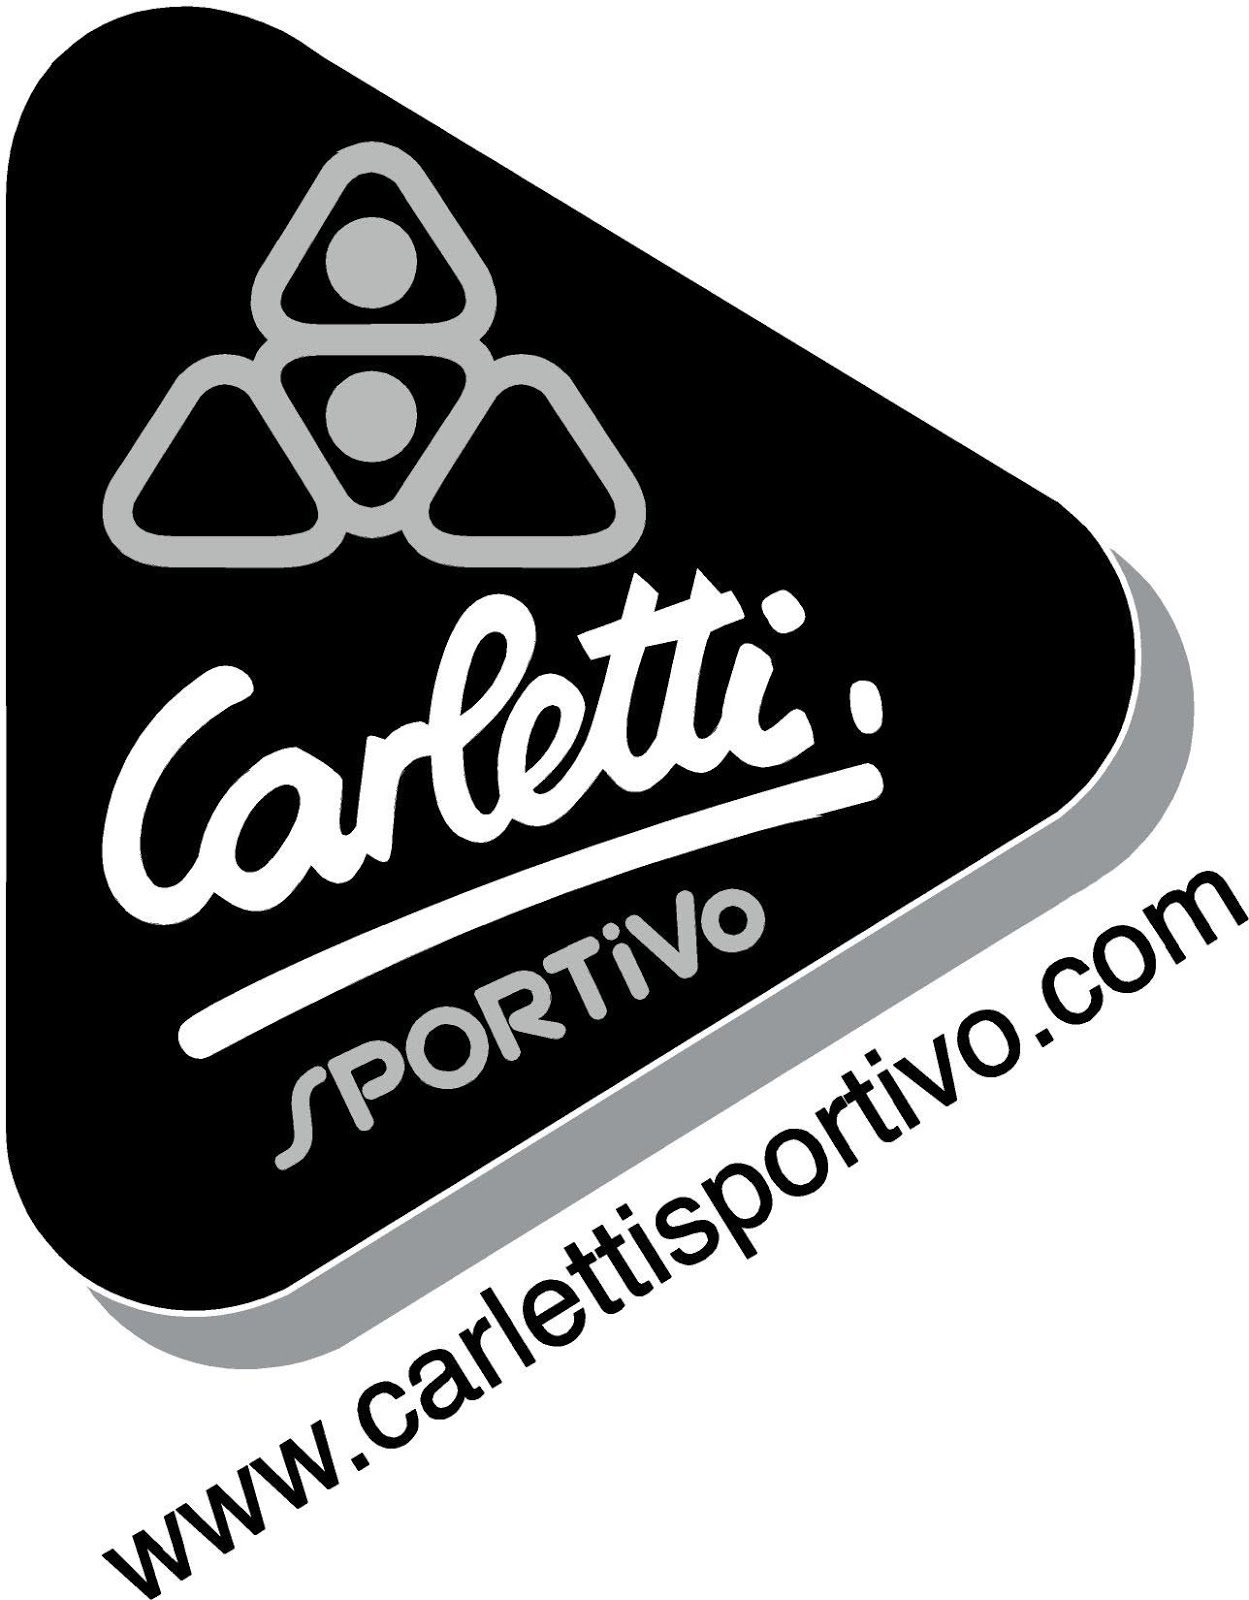 Carletti sportivo